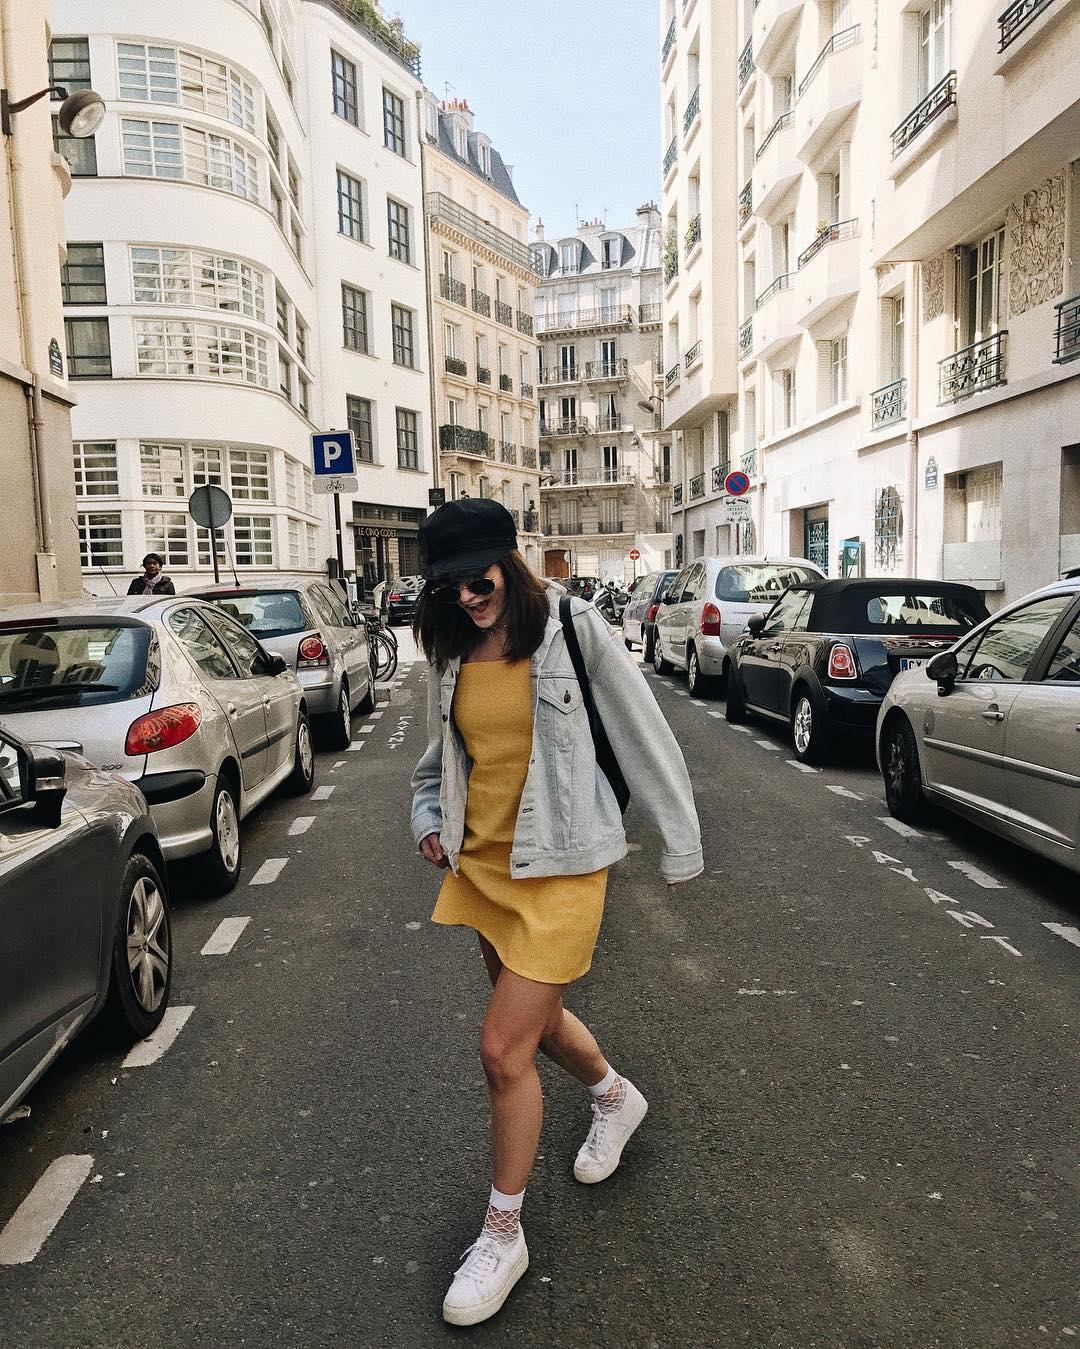 denim jacket and yellow dress look